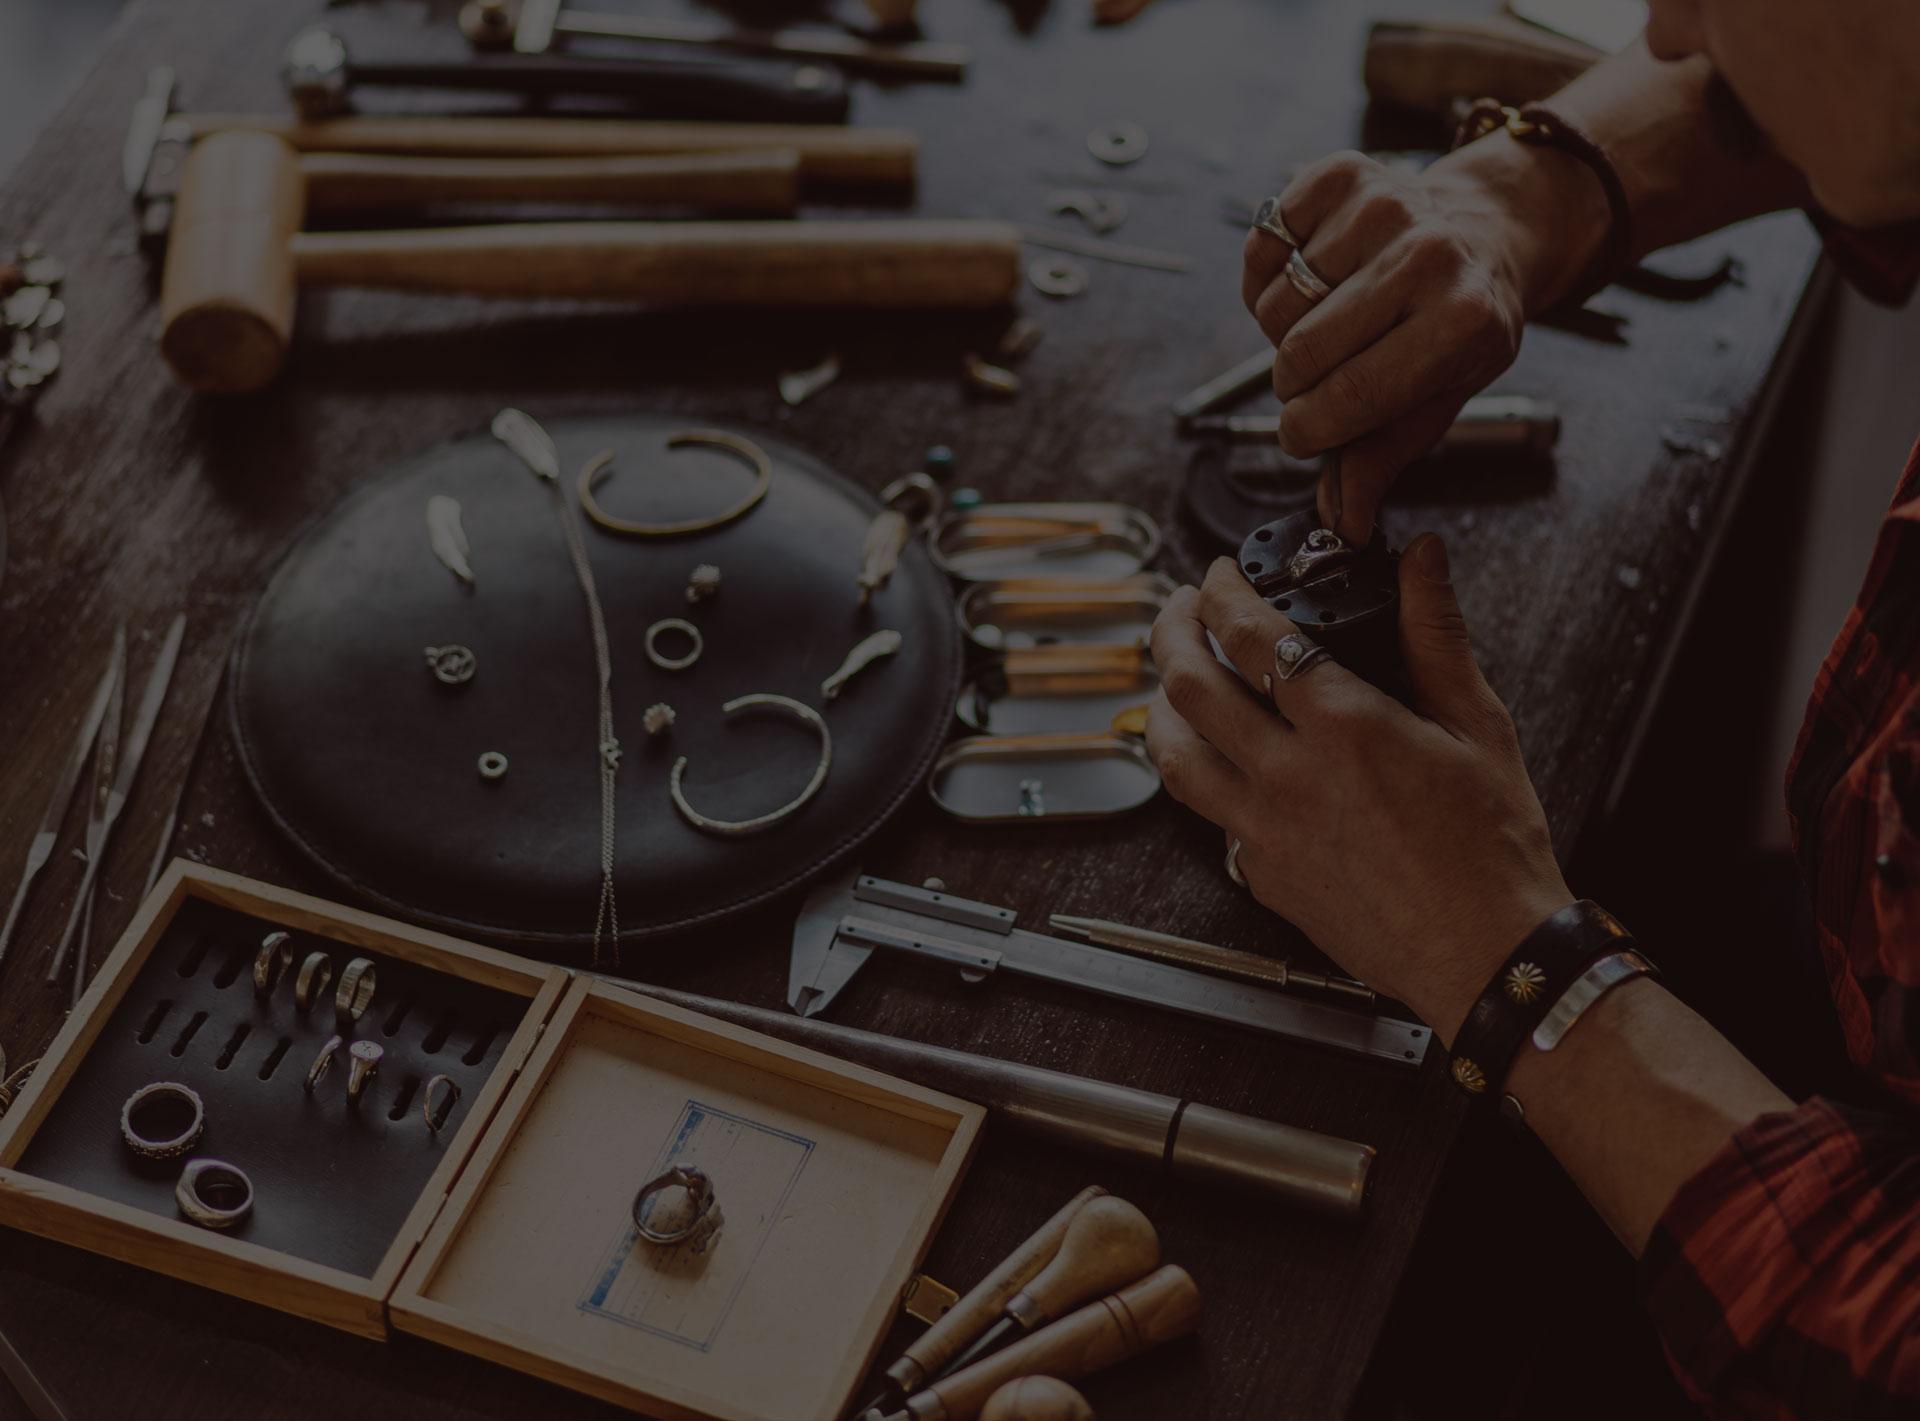 L'artisanat d'art